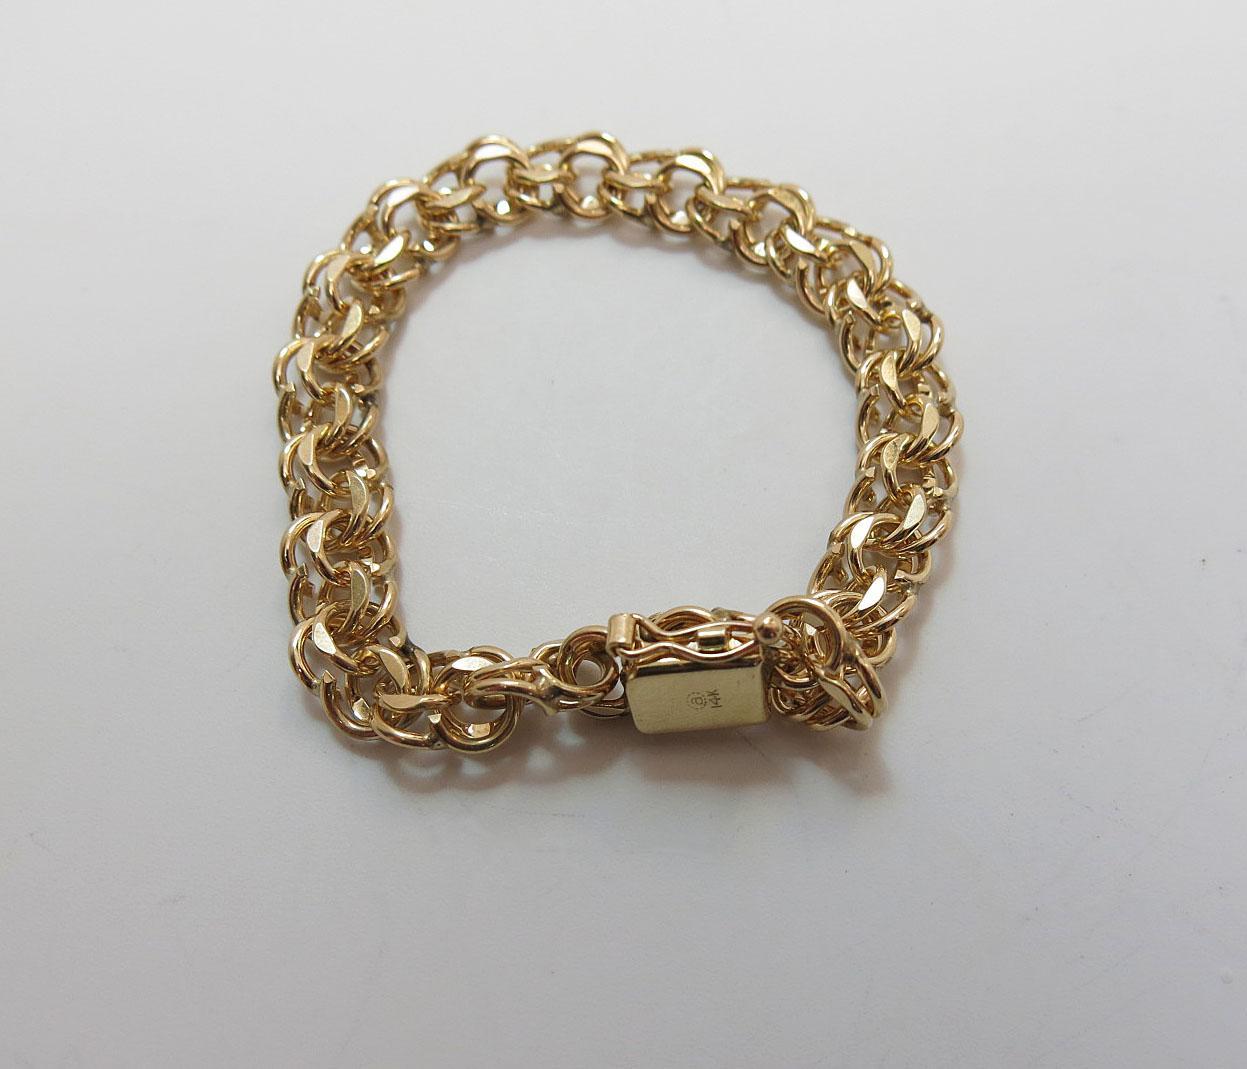 Vintage 14k Gold Charm Bracelet: 1960's Vintage Heavy 14K Yellow Gold Double Curb Link